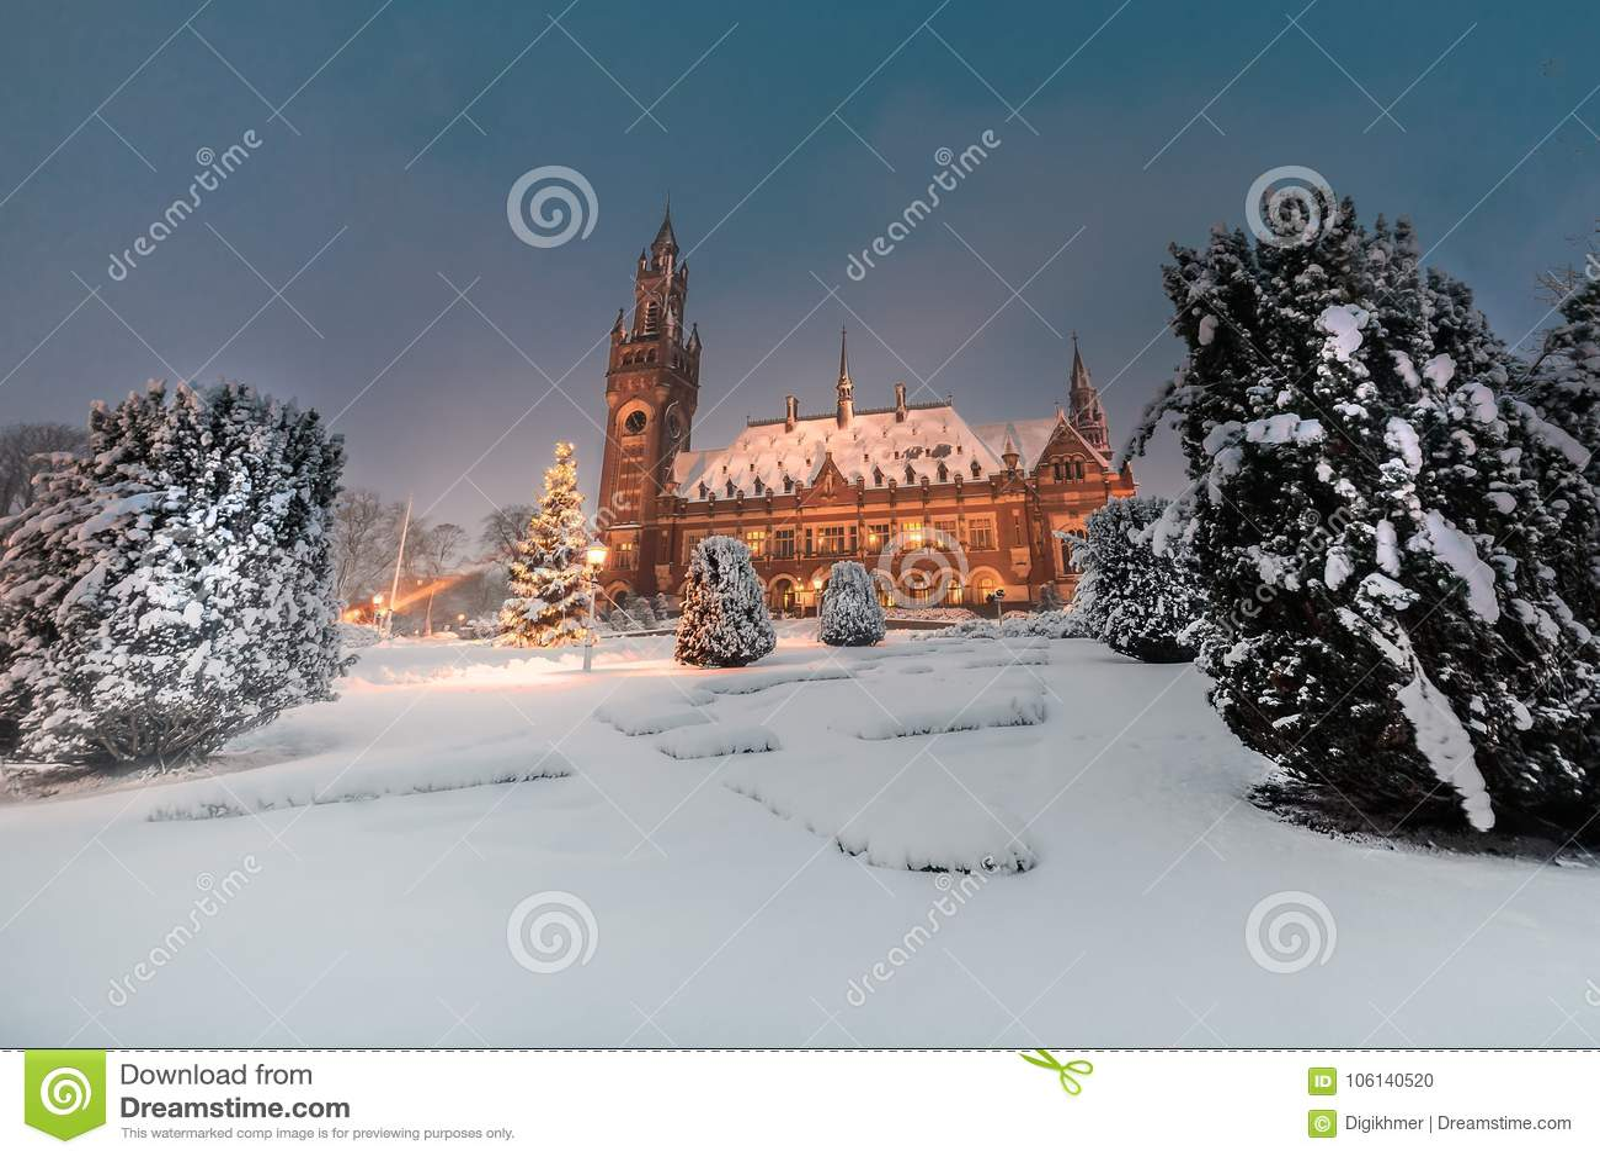 Fredslott, Vredespaleis, under snöqt-natten